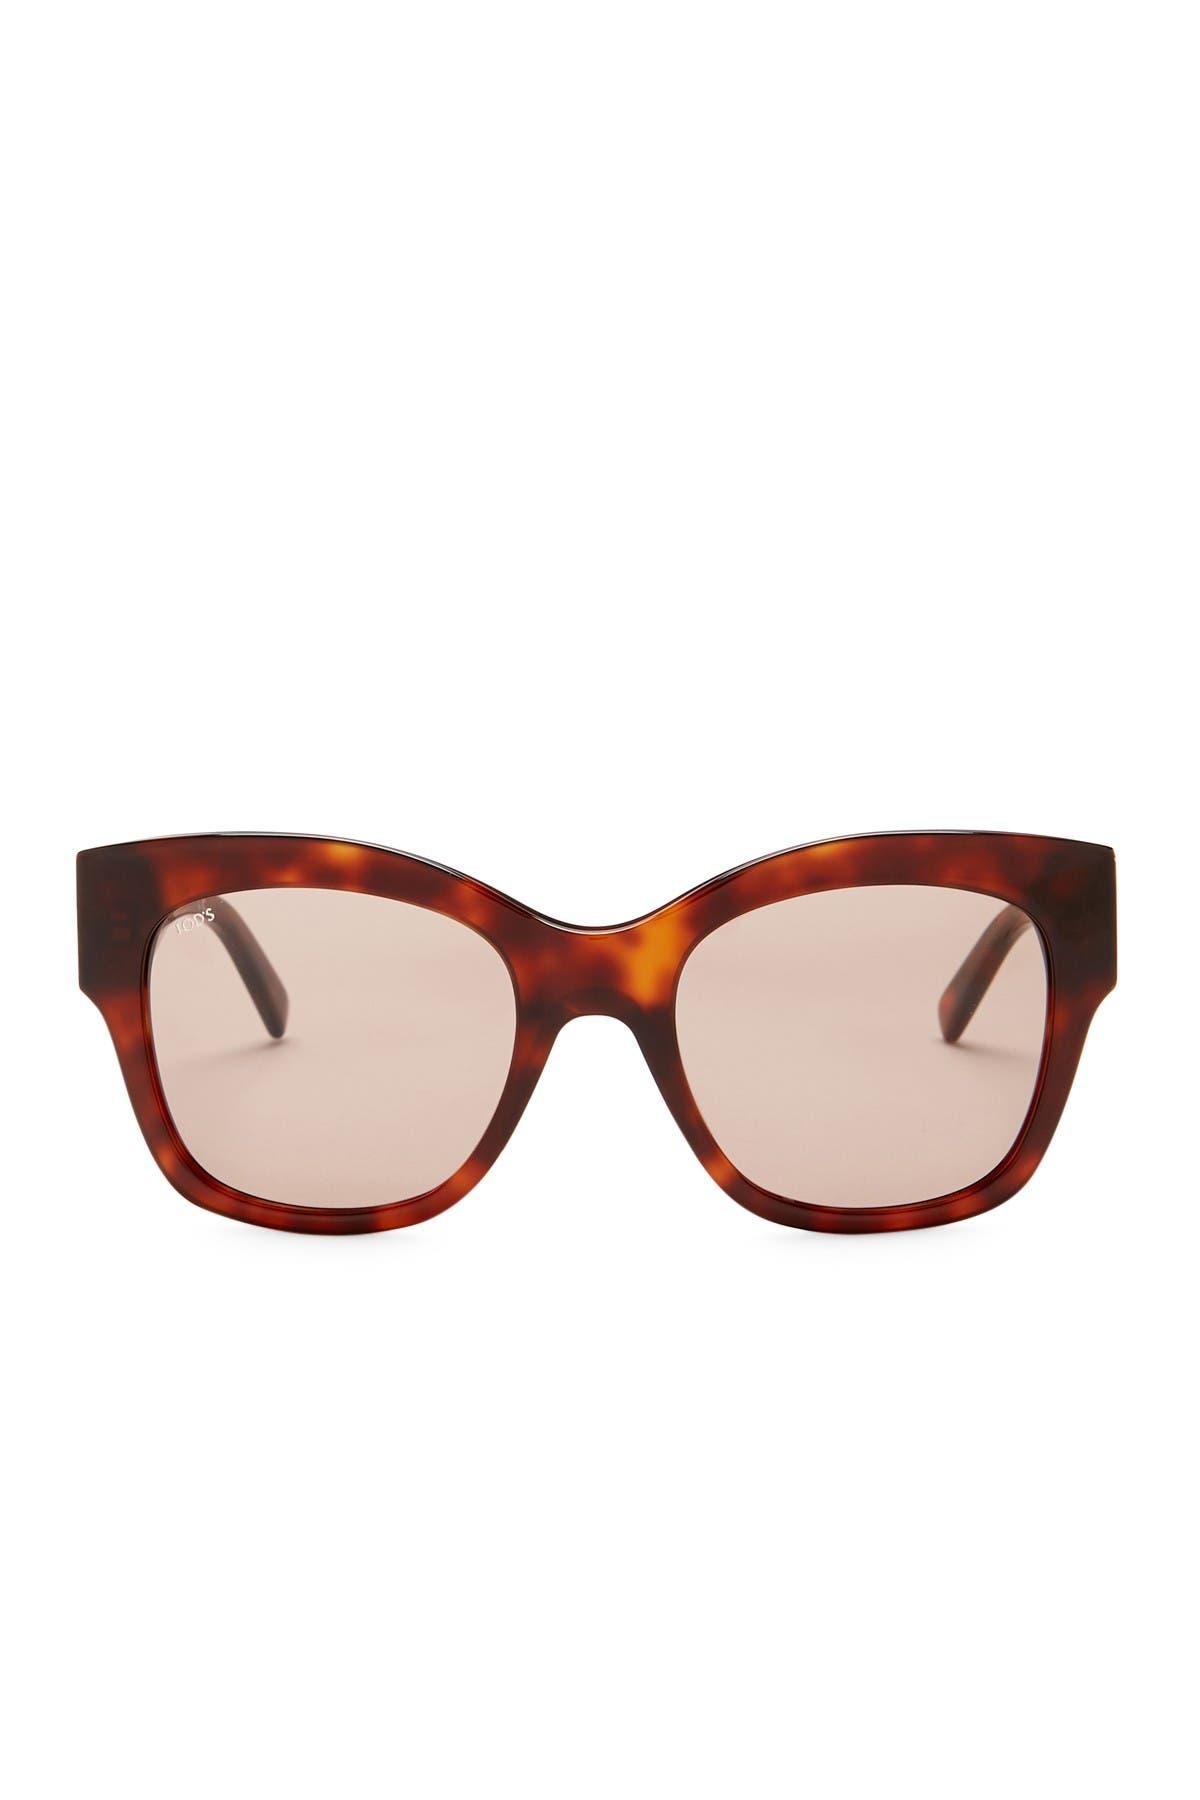 Image of Tod's 53mm Cat Eye Sunglasses